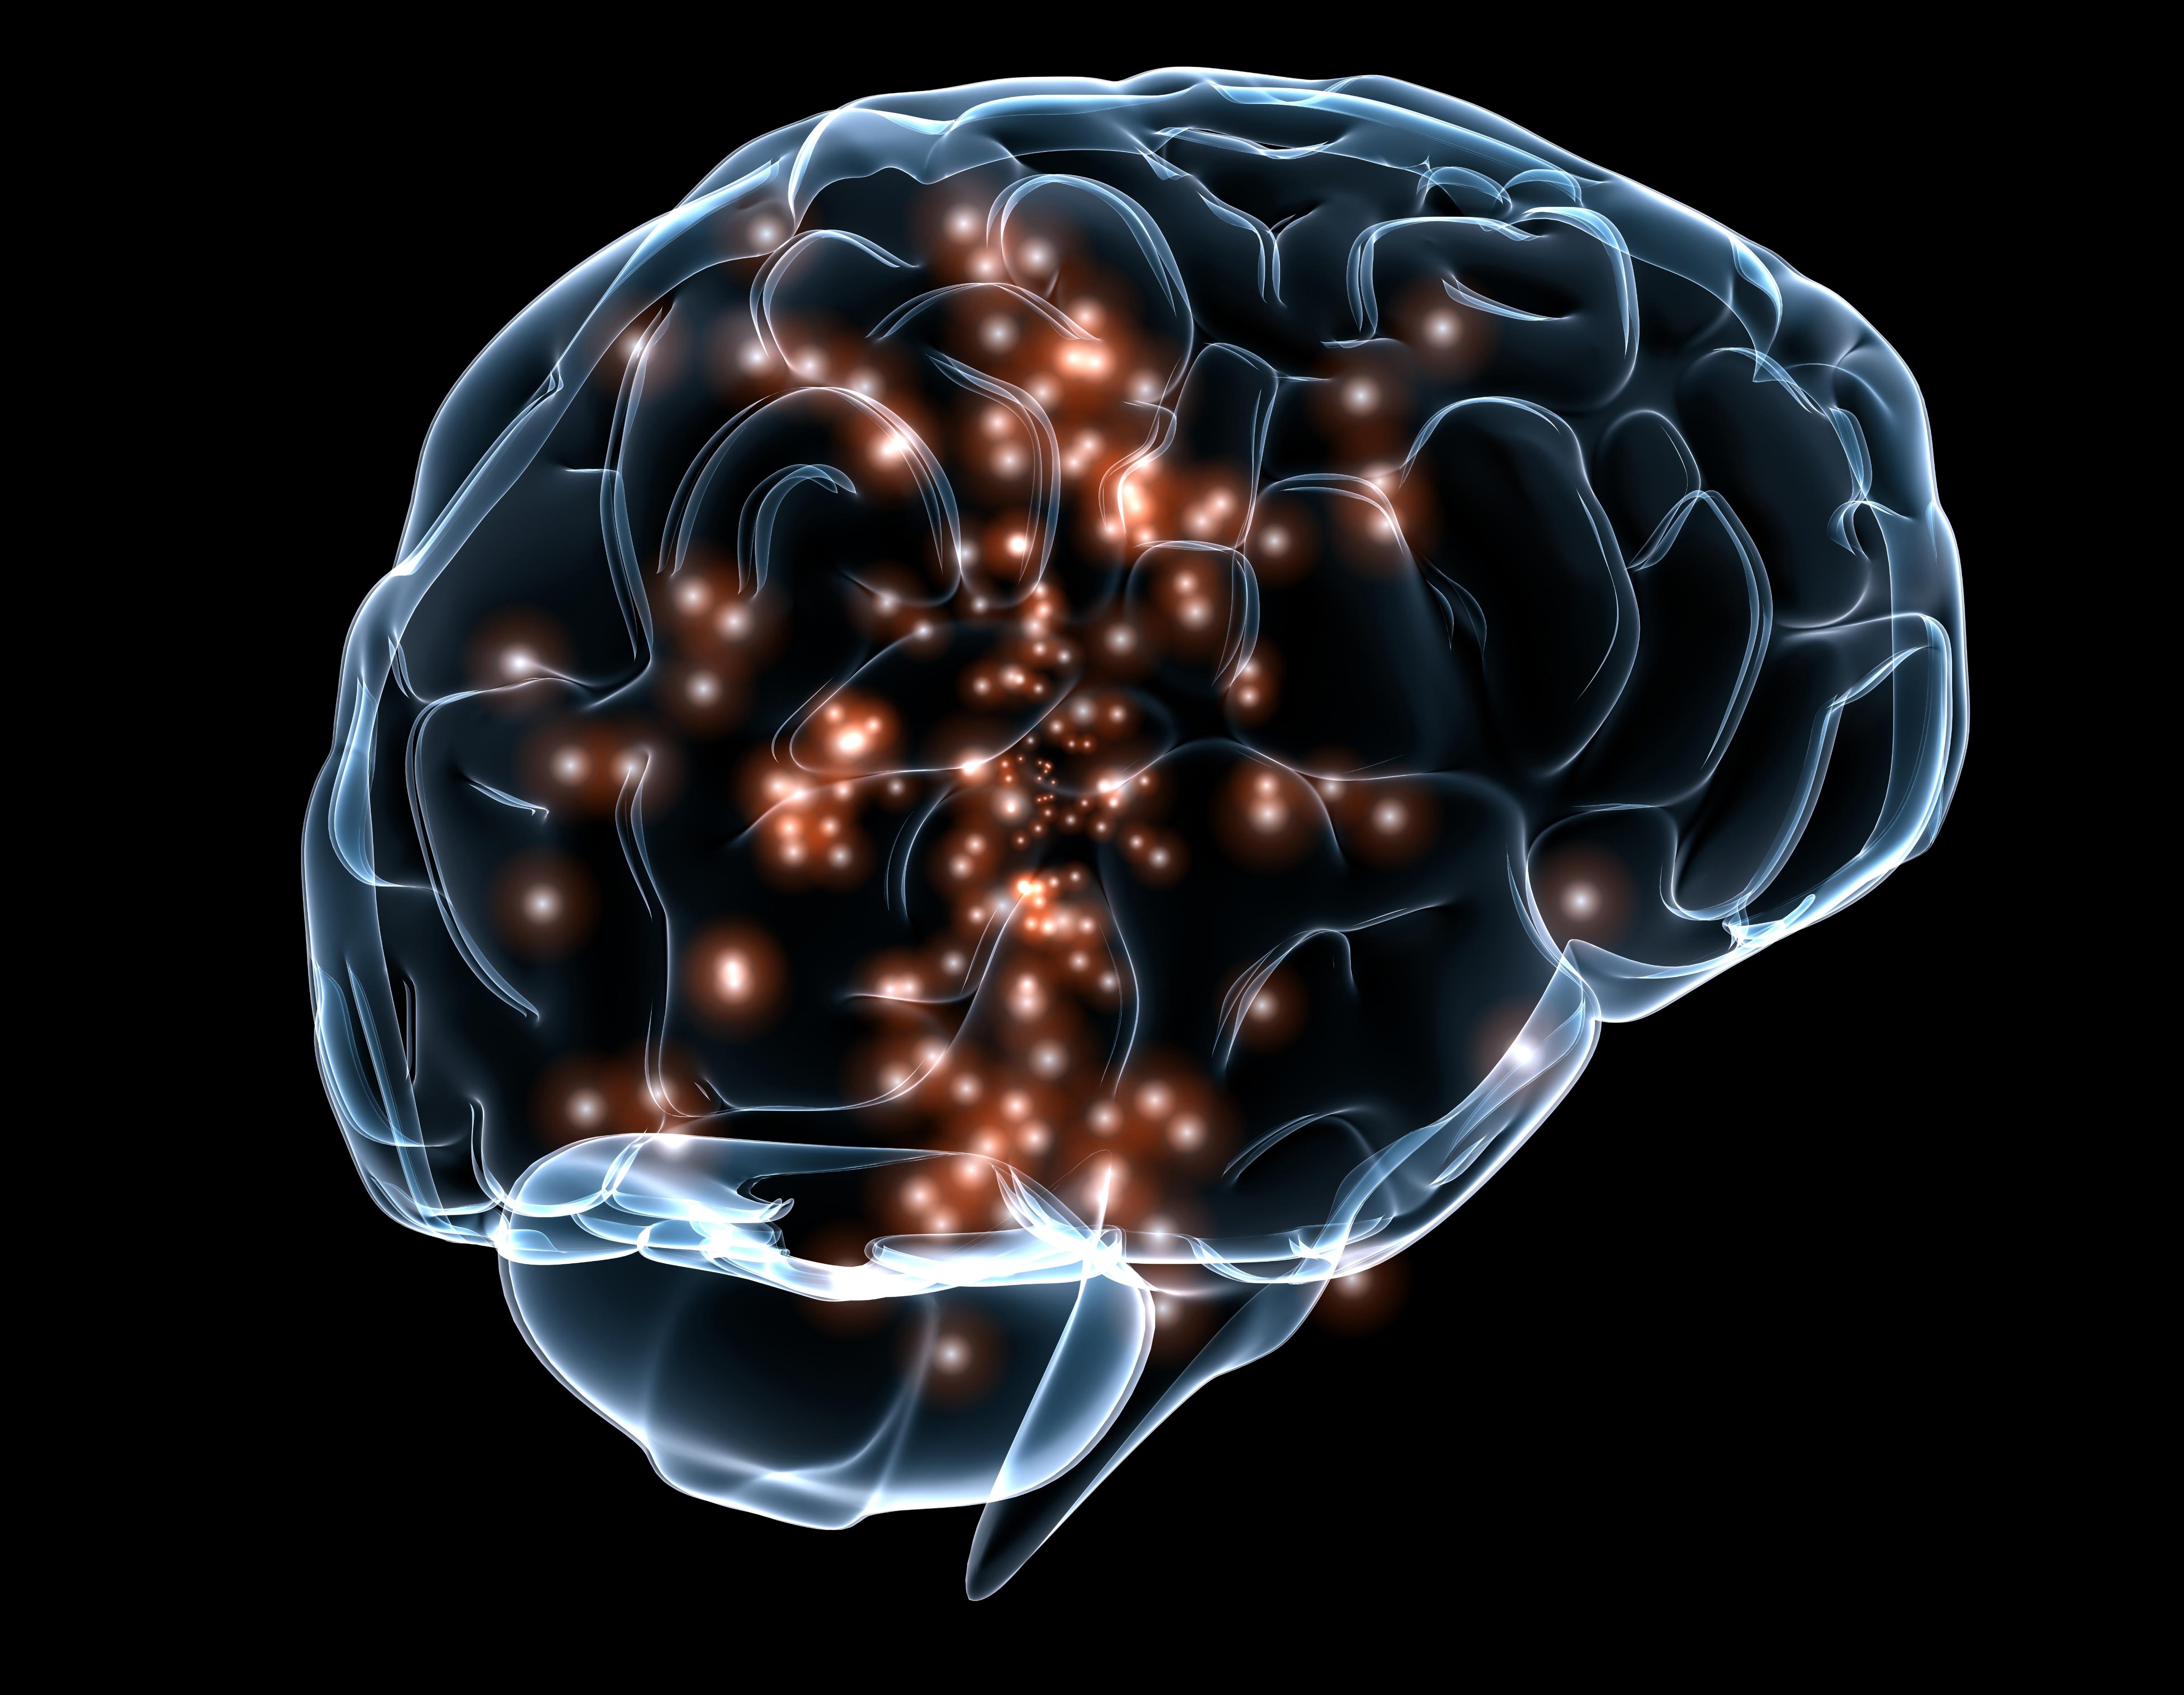 darpa program to develop brain implants for mental disorders - cbs, Cephalic Vein